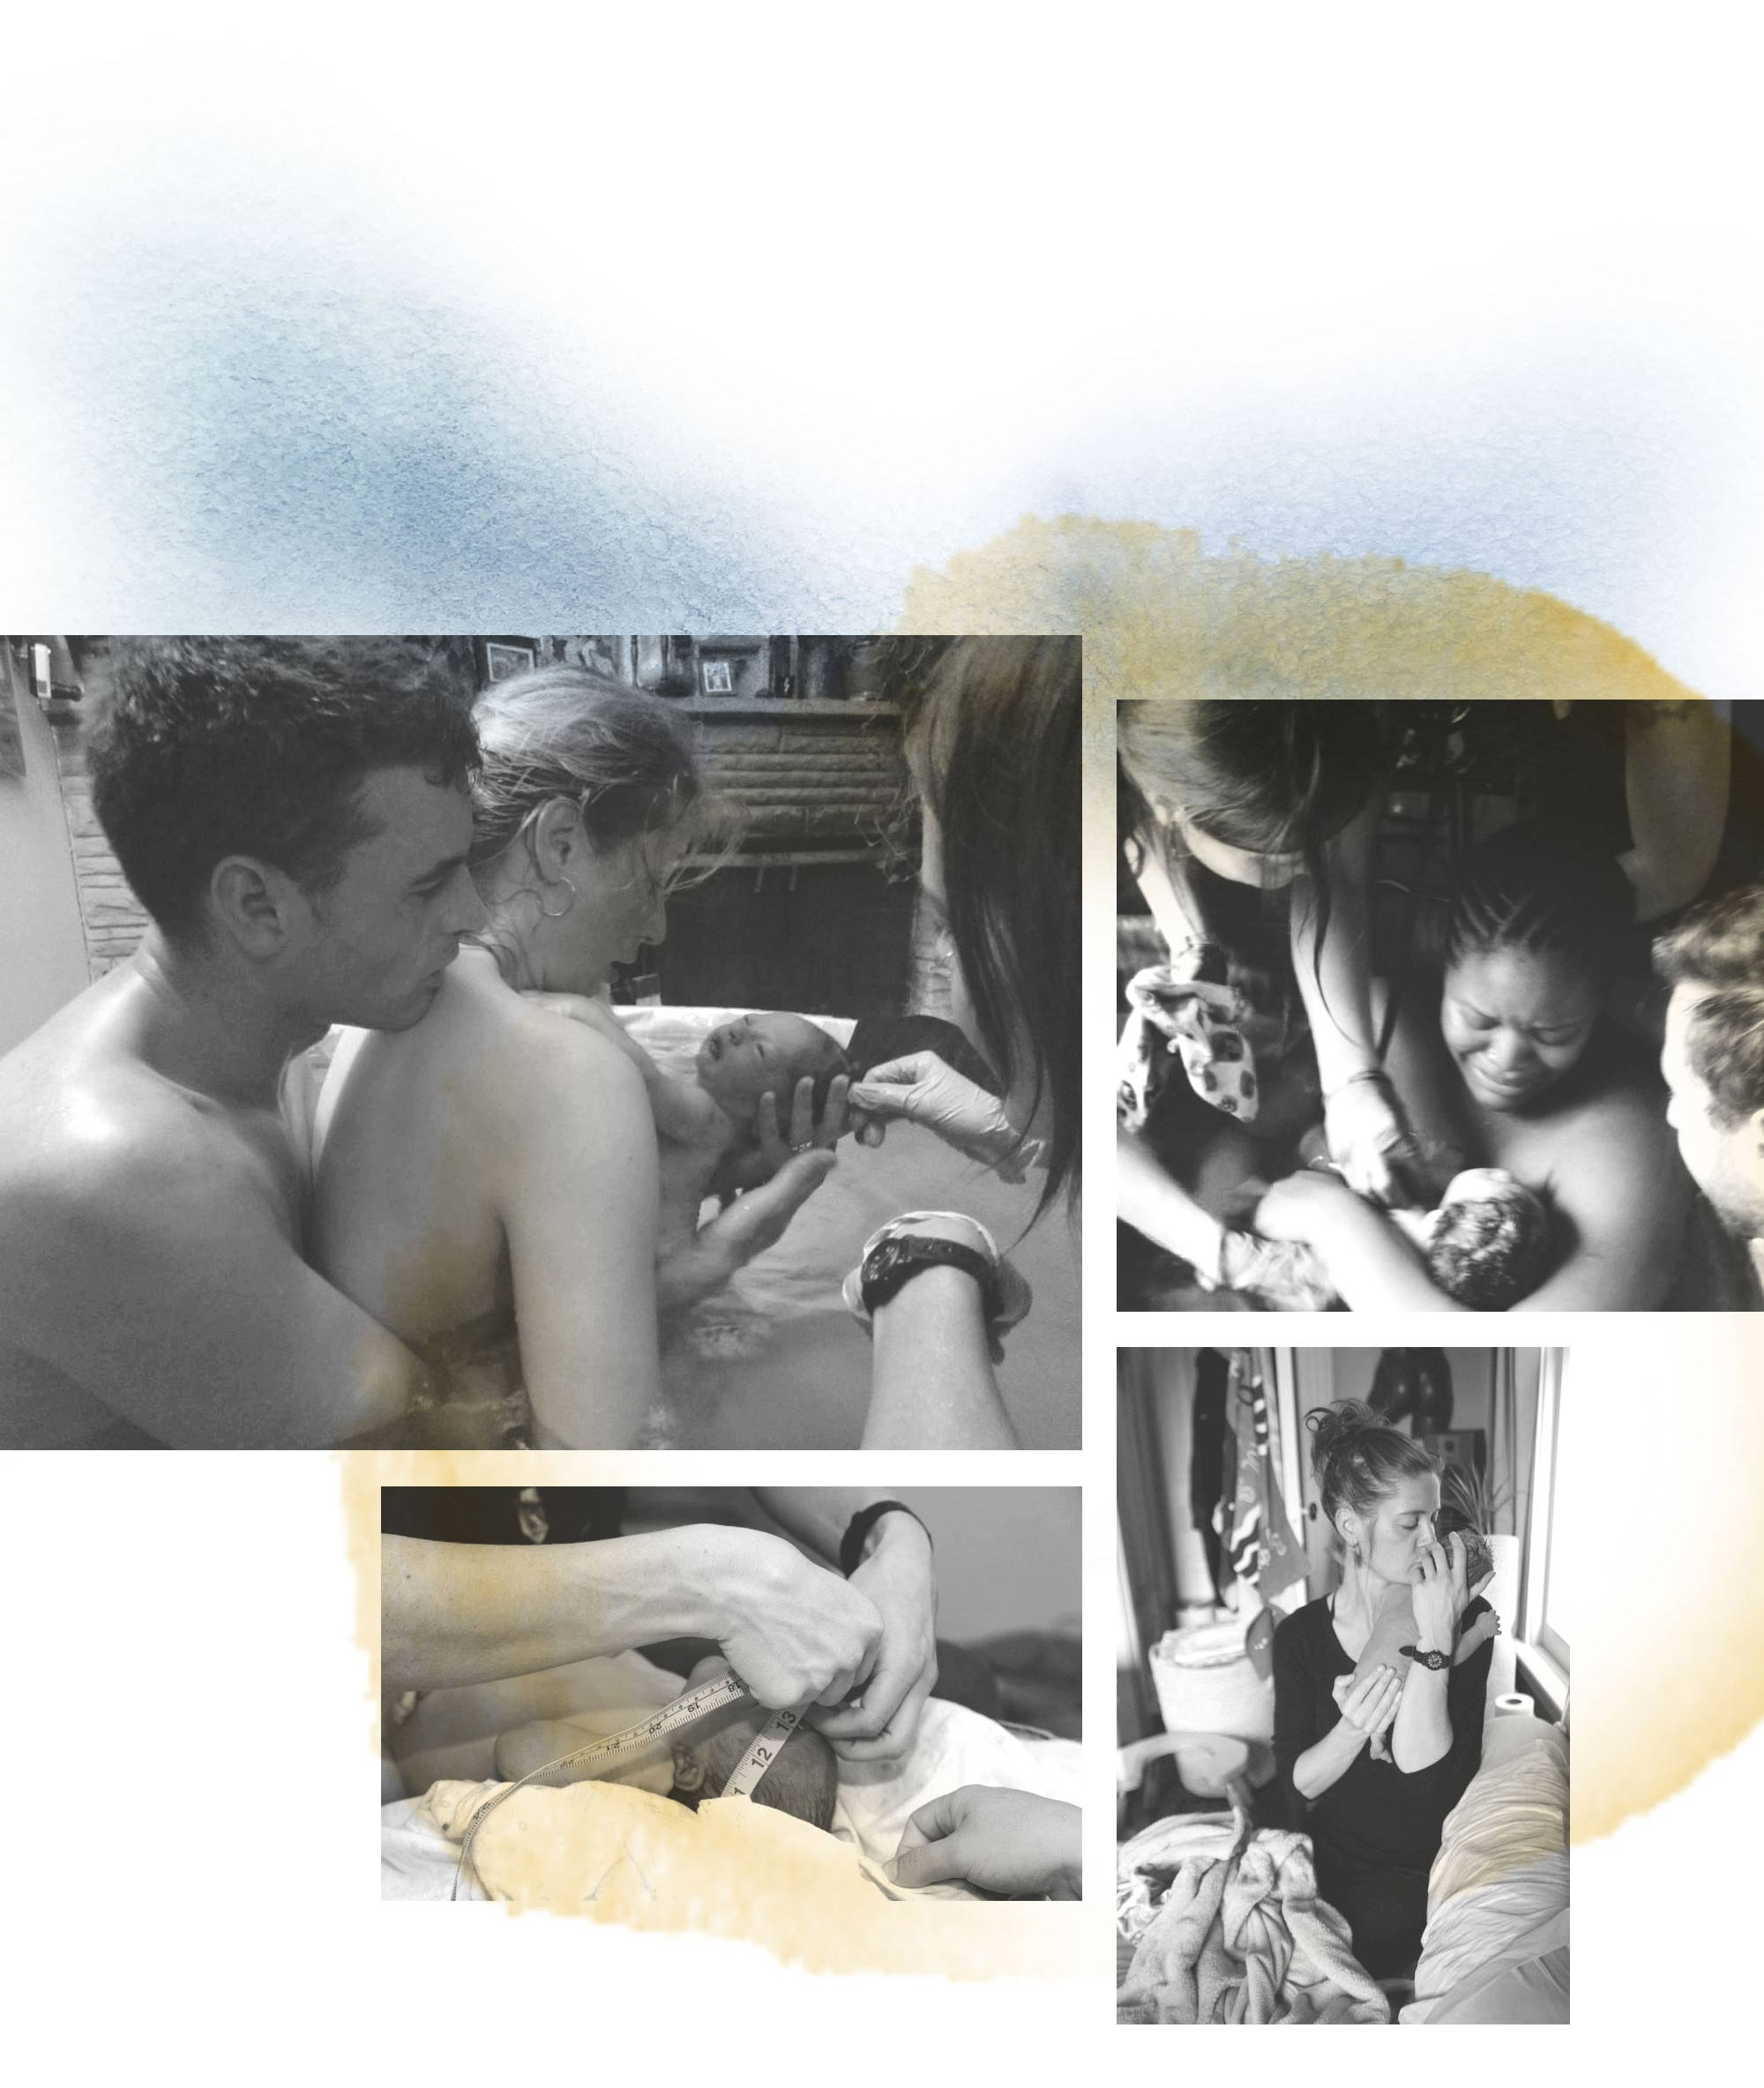 women-born-kelly-murphy-midwife-sanfrancisco-homebirth-2.jpg